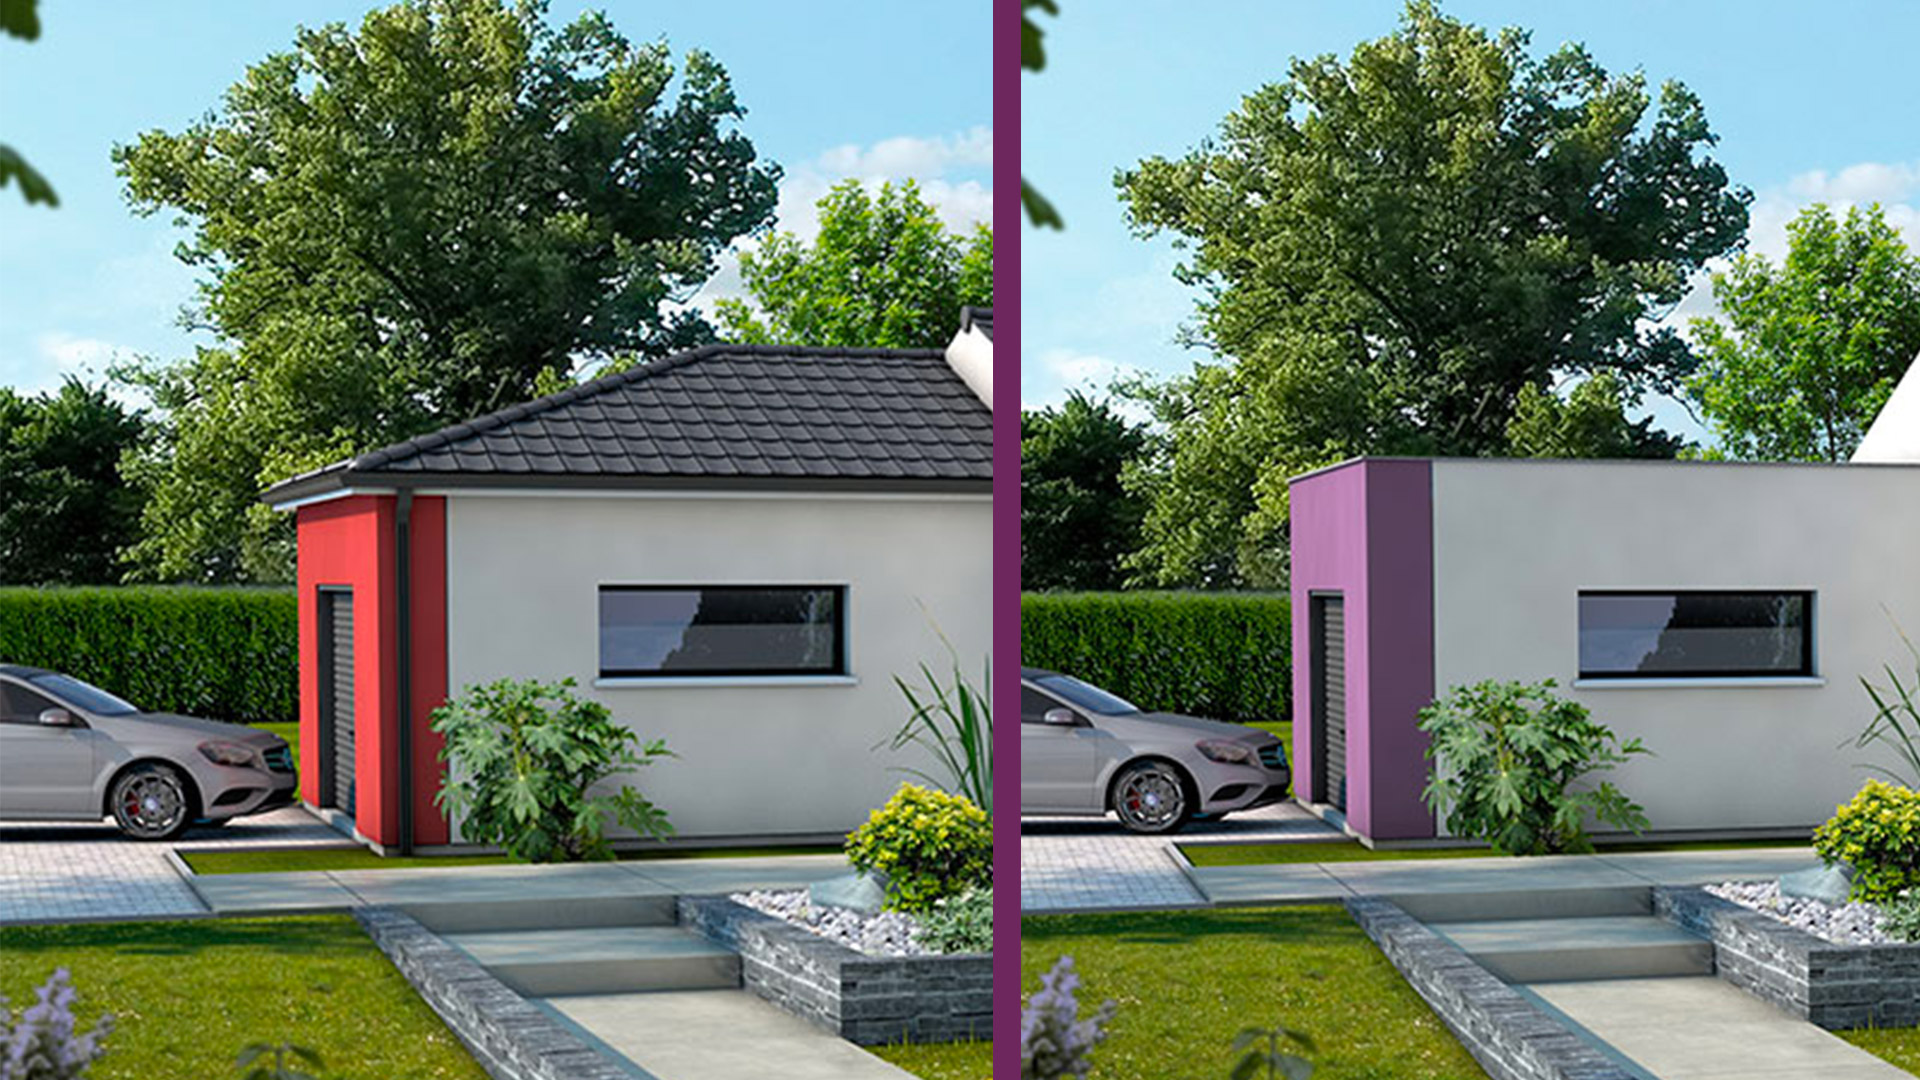 https://www.maisonsclairlogis.fr/wp-content/uploads/garage-toit.jpg